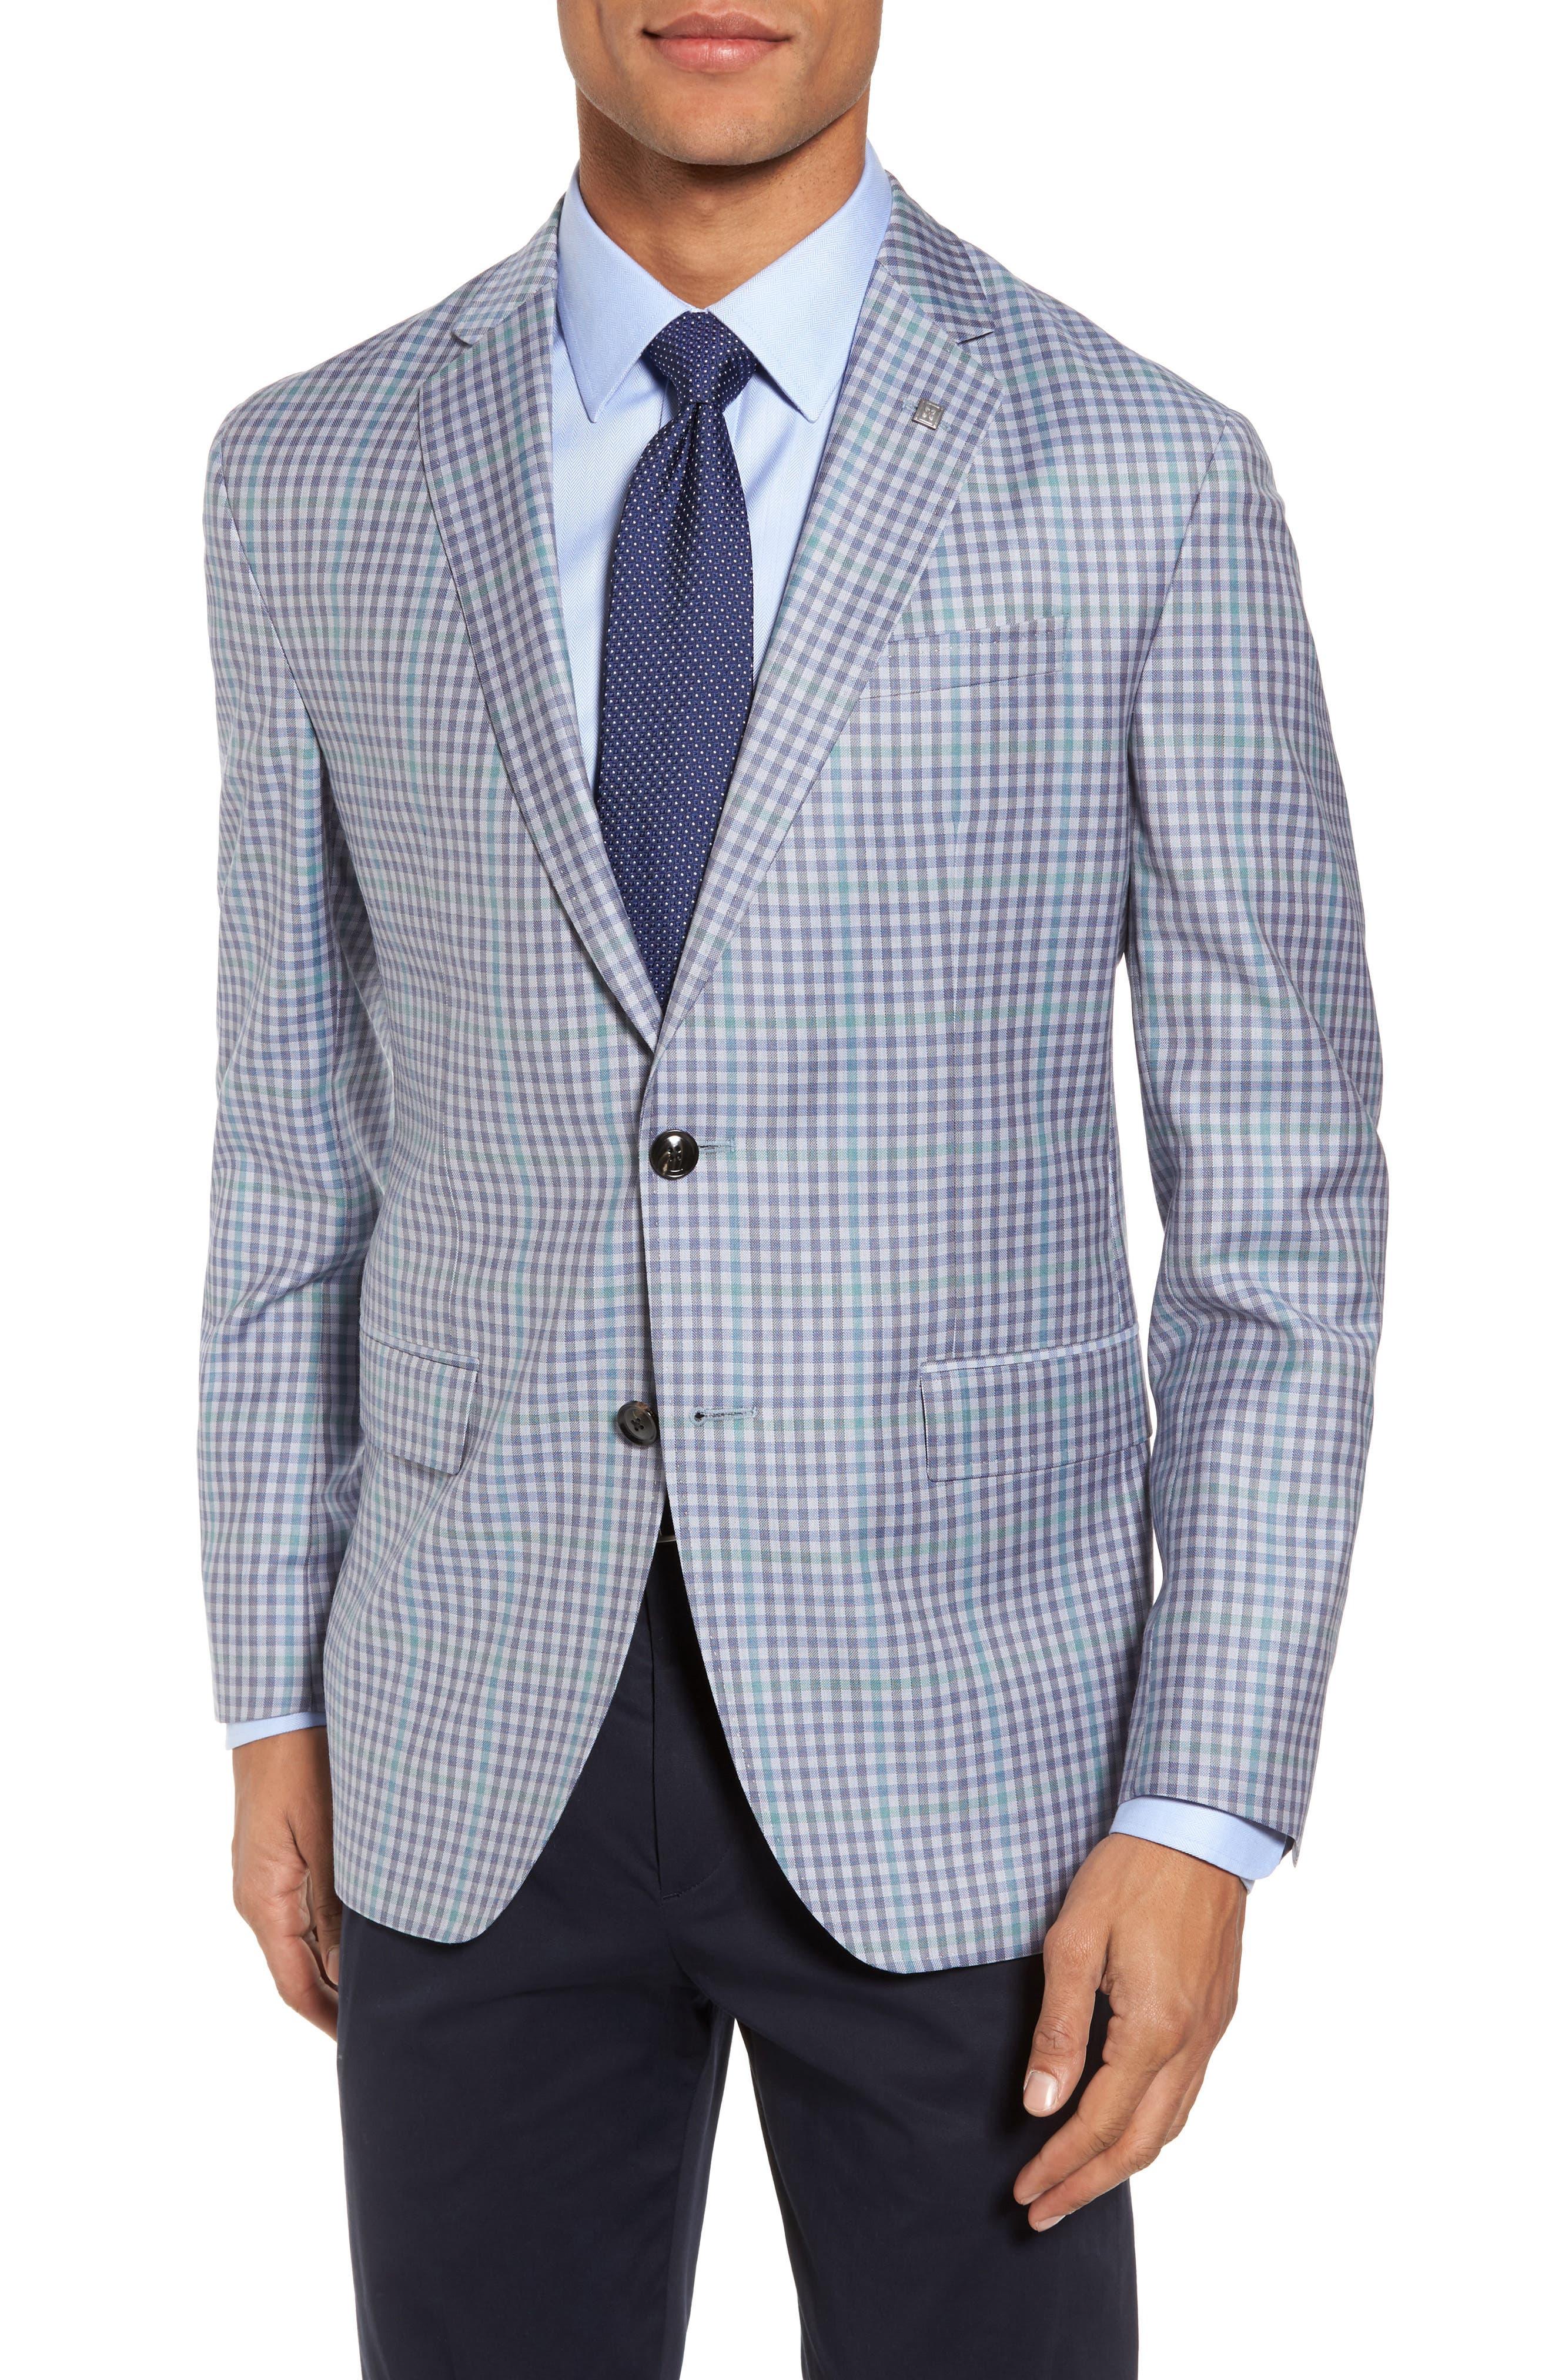 Konan Trim Fit Check Wool Sport Coat,                         Main,                         color, Blue Grey Green Ck